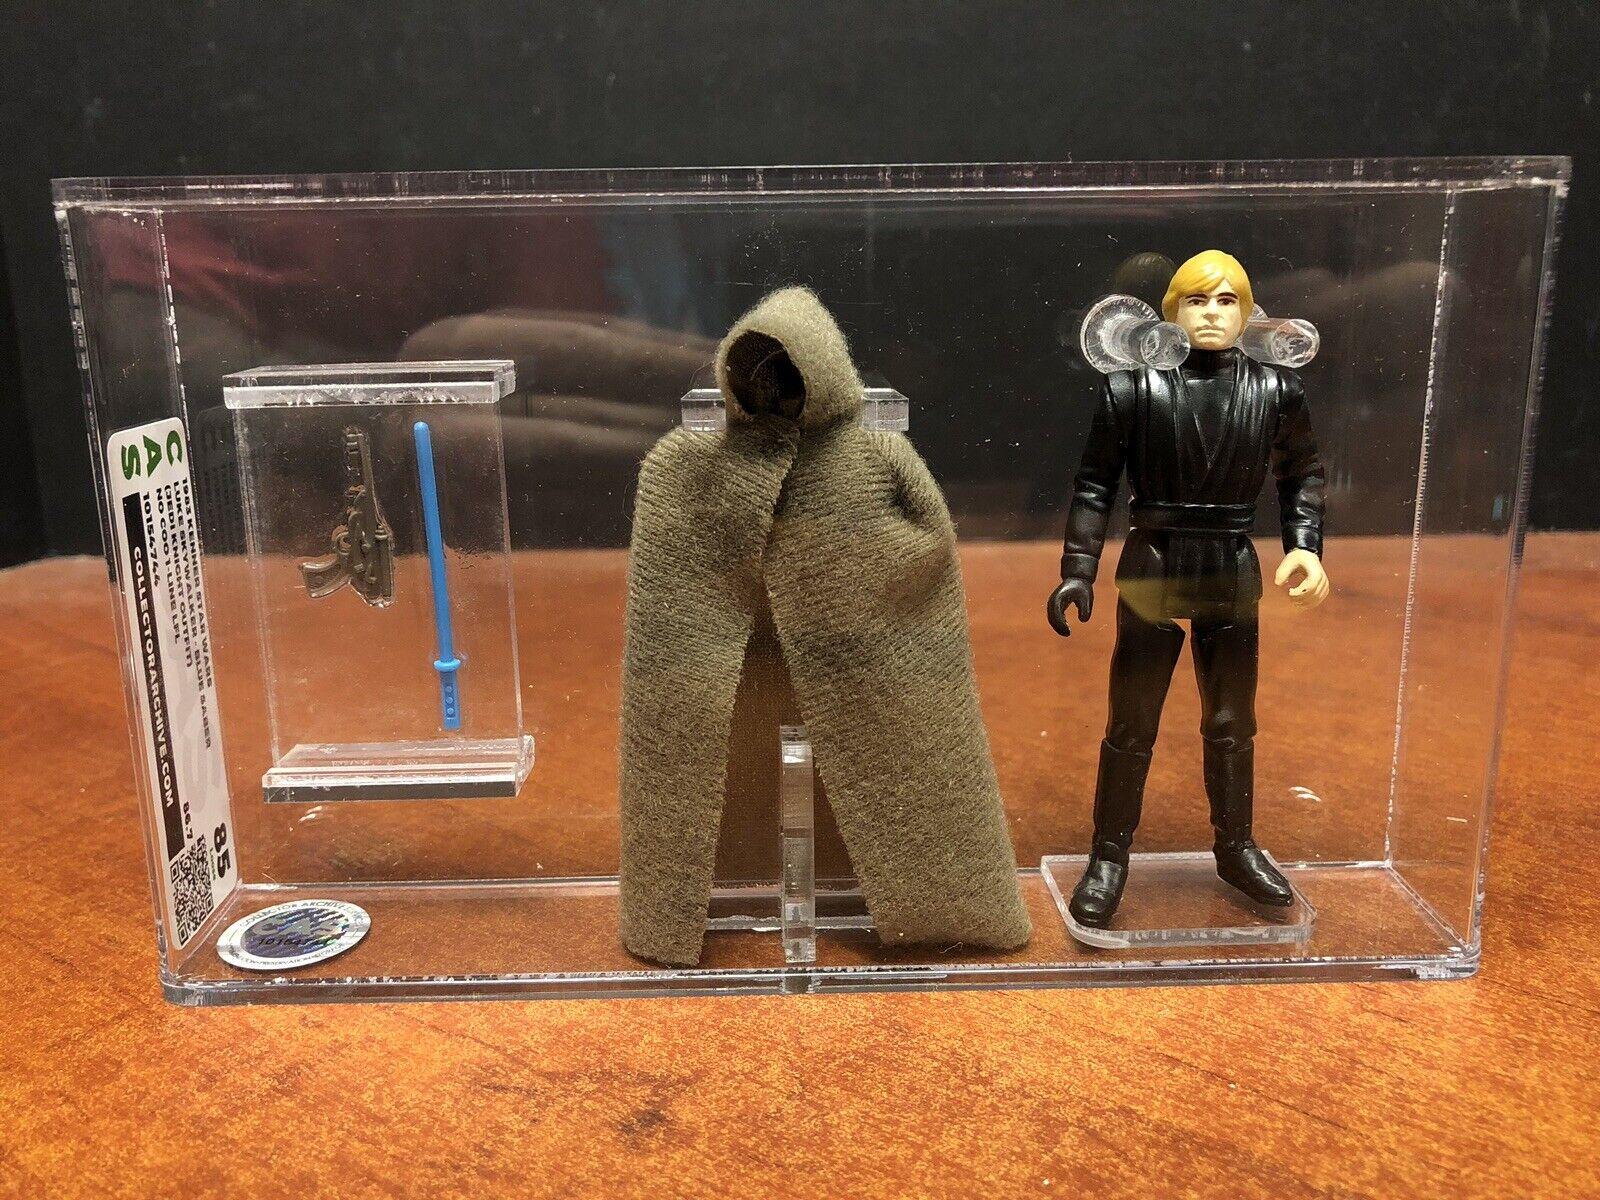 1983 Estrella Wars Luke Skywalker Azul Sable Jedi Knight Disfraz Cas 85 EMF3851